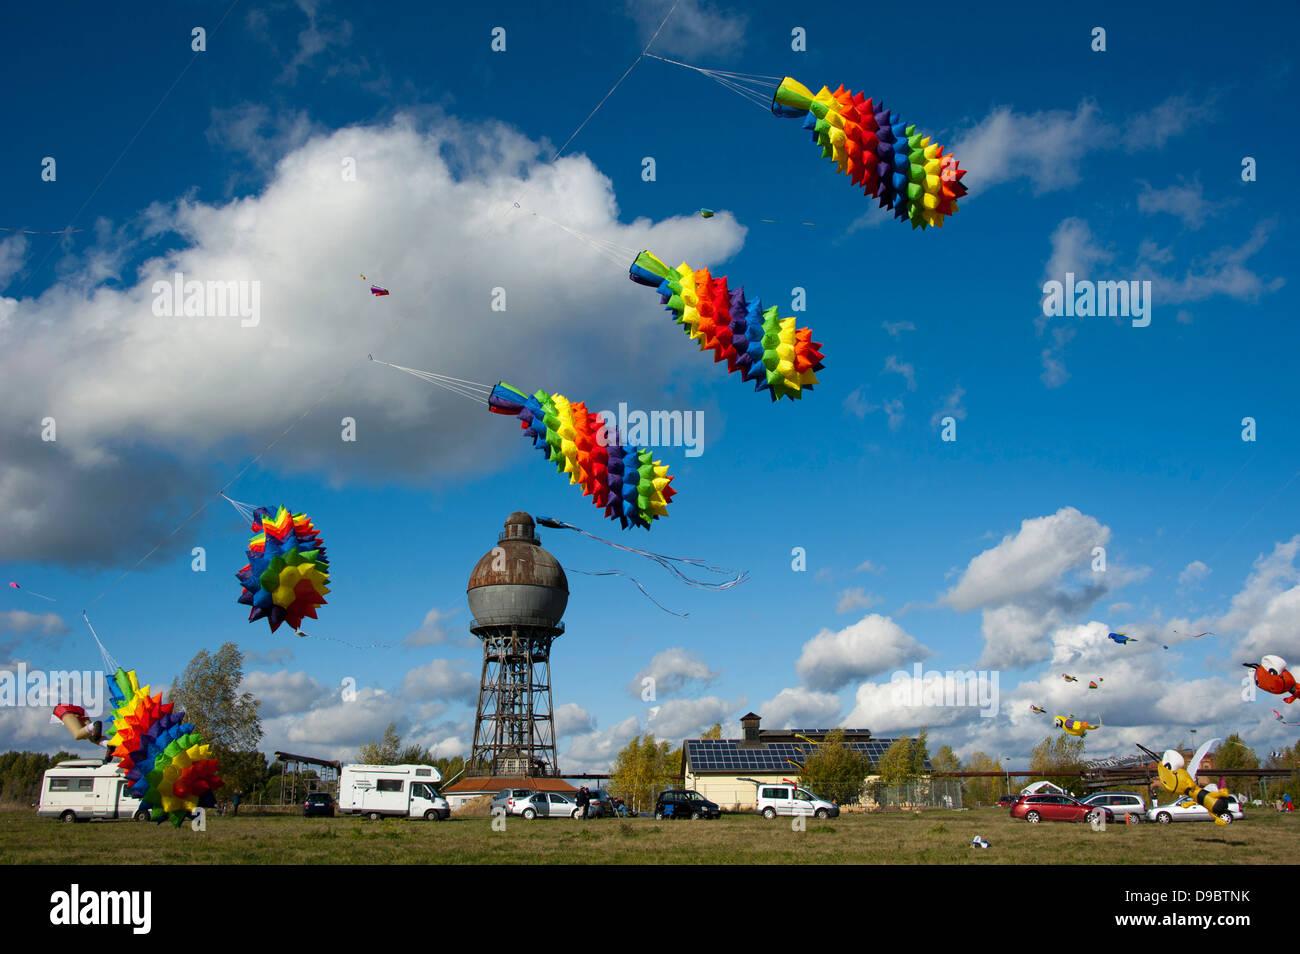 Kite festival, Ilseder Hutte, Ilsede, Lower Saxony, Germany, Ilseder H³tte , Drachenfest, Ilseder Huette, Ilsede, - Stock Image